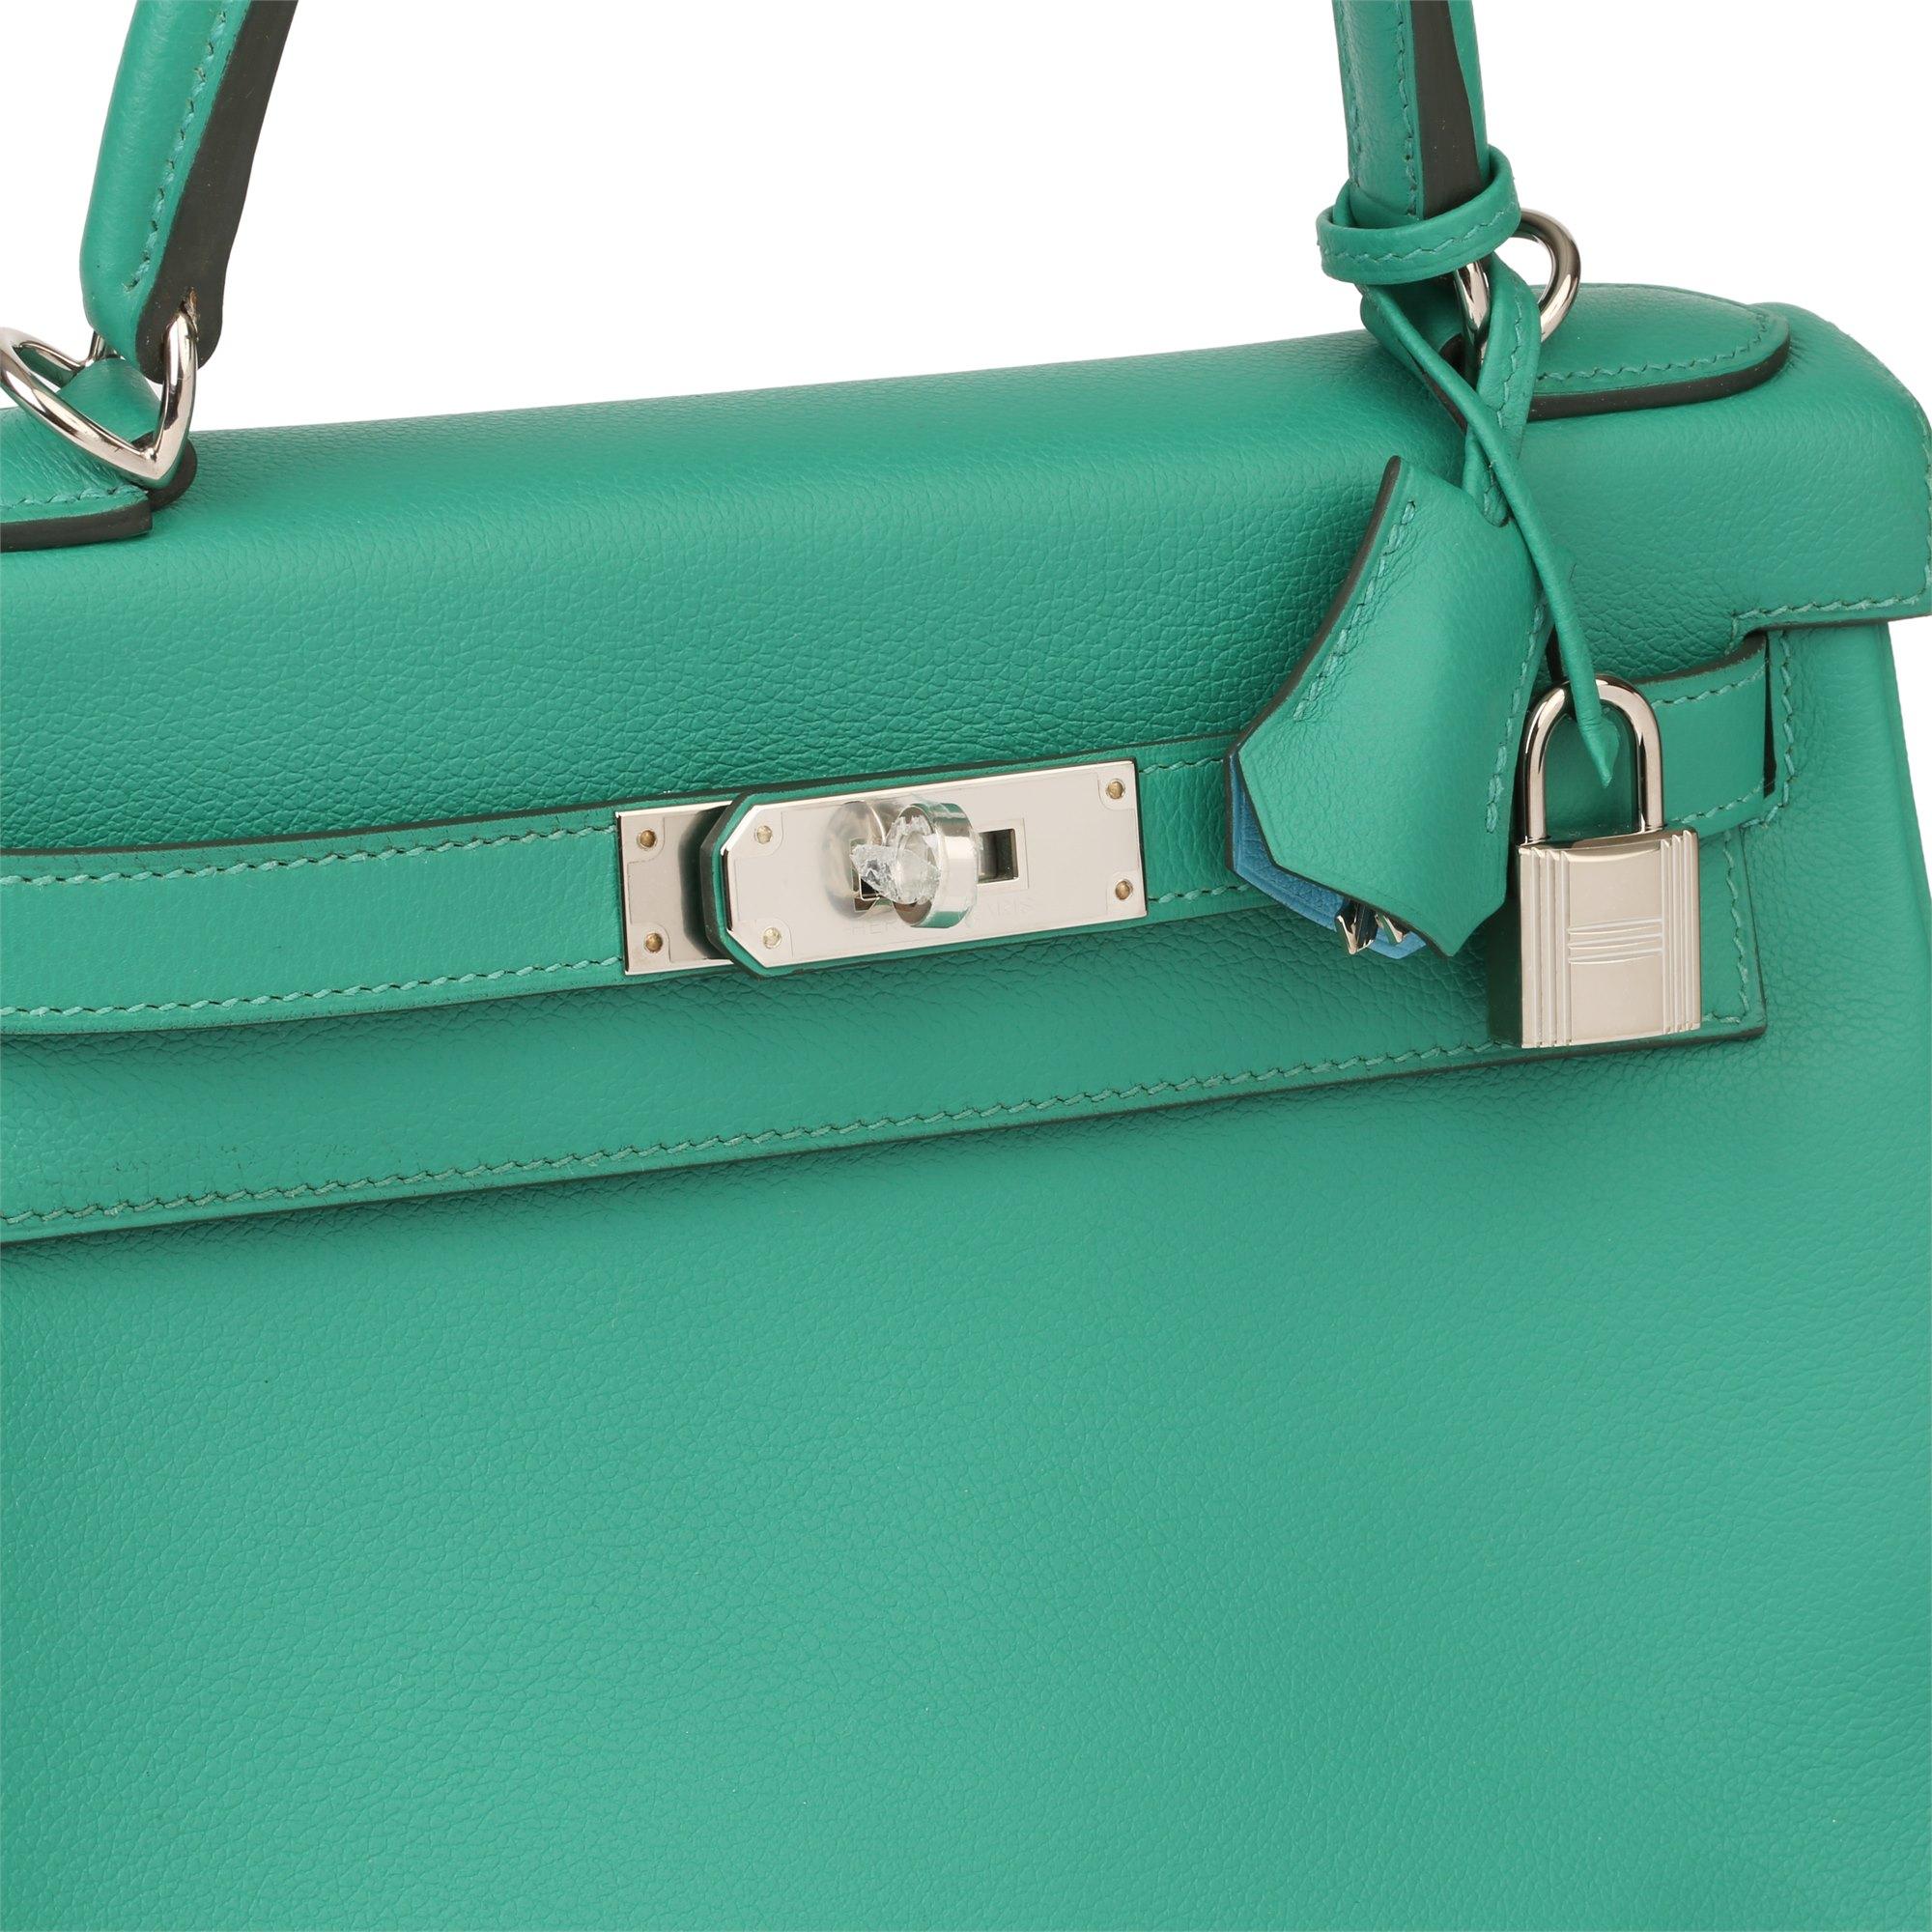 Hermès Vert Verone & Blue du Nord Evercolor Leather Verso Kelly 28cm Retourne